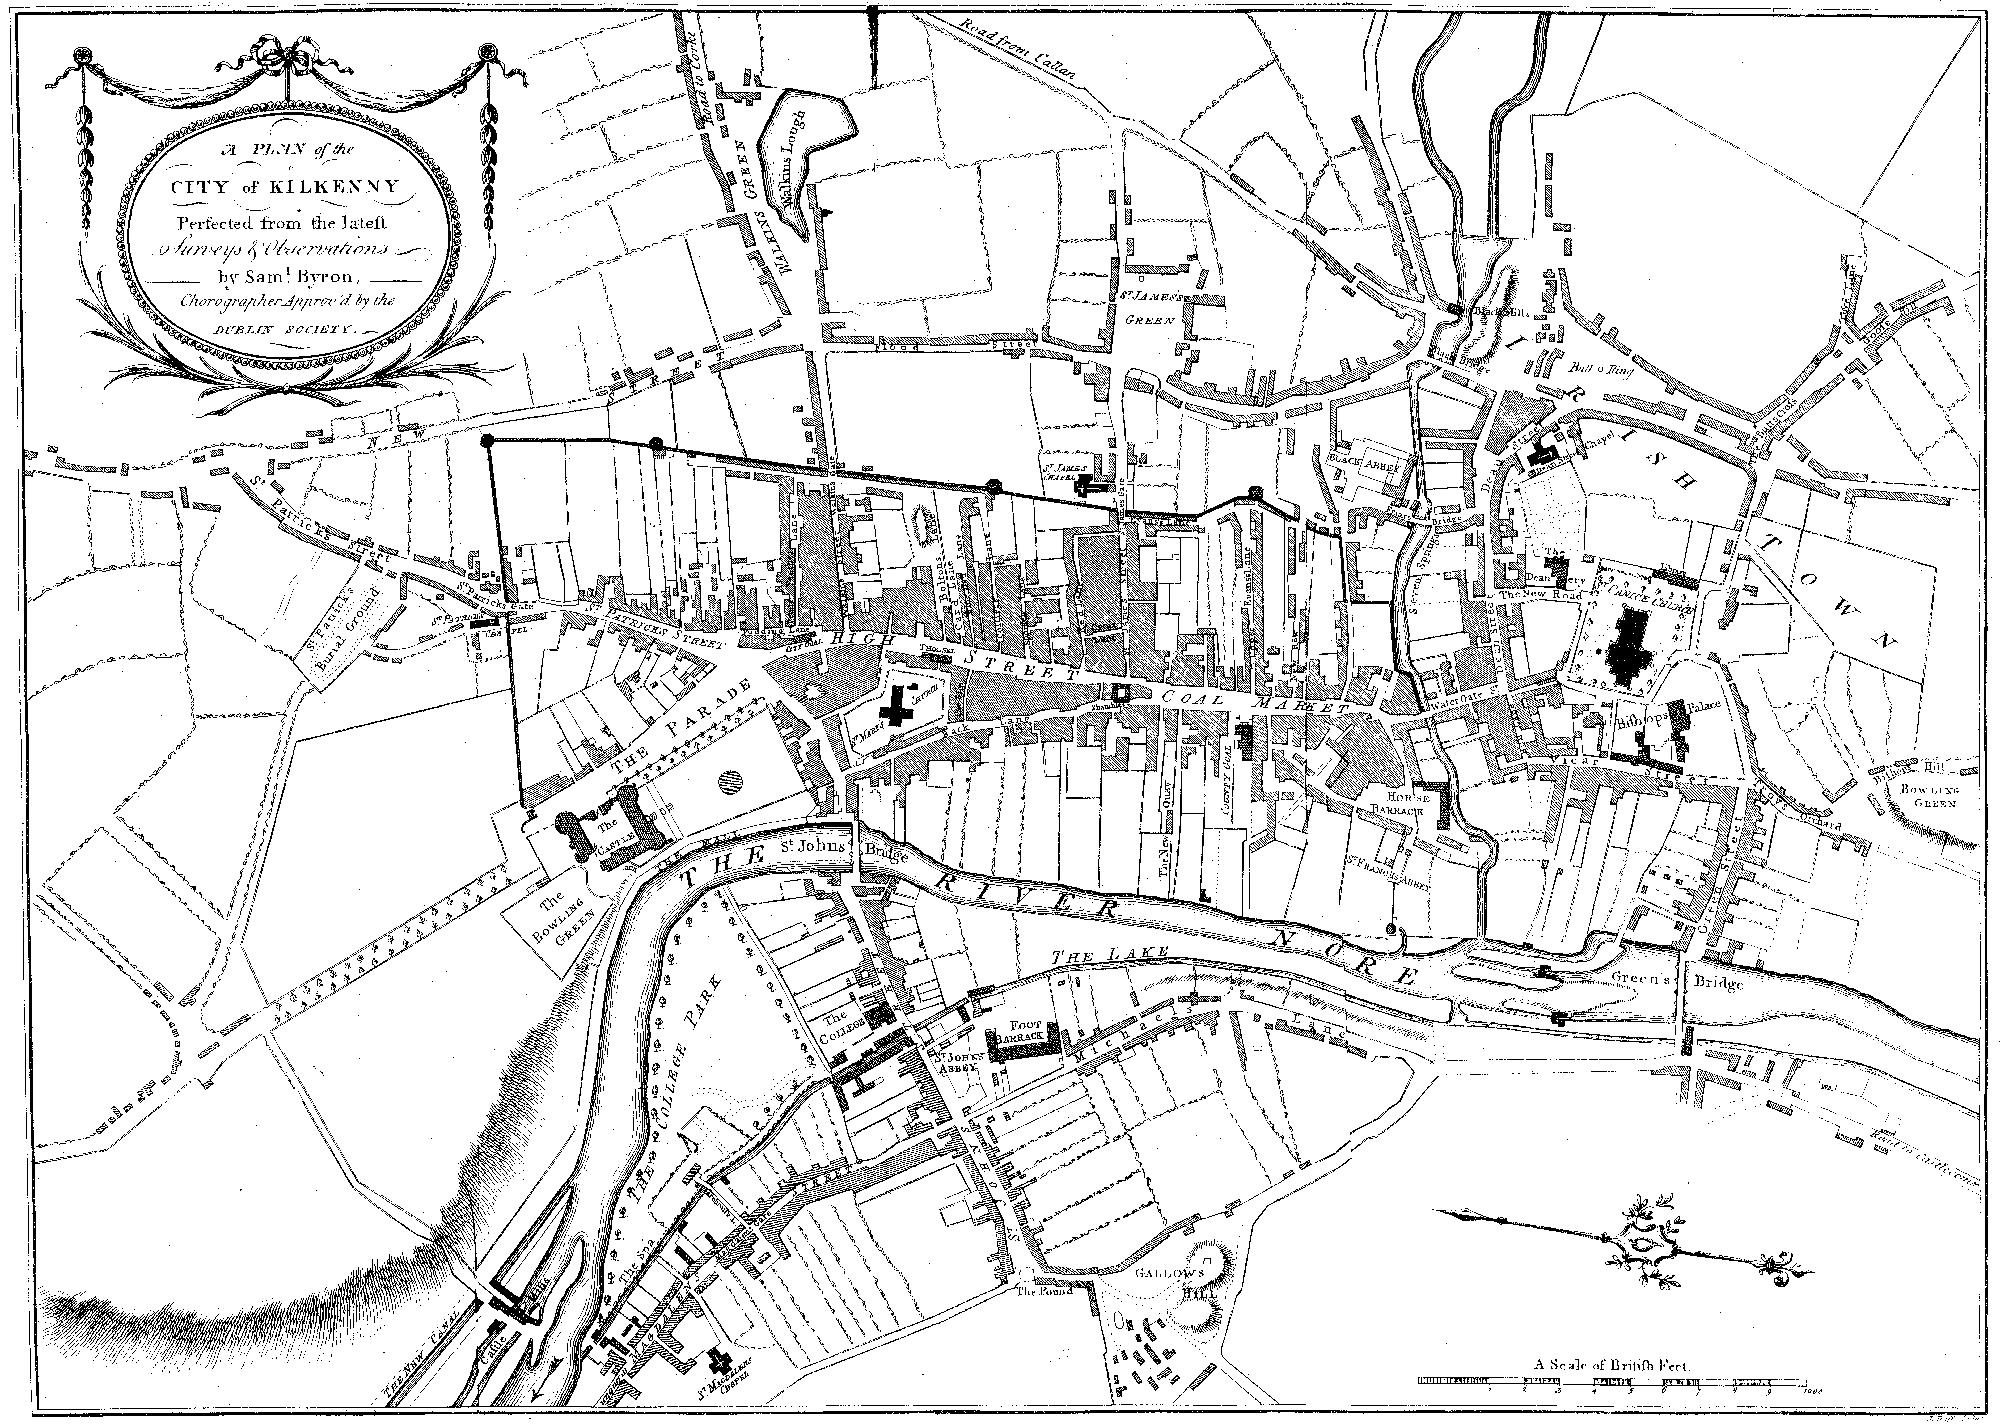 Filesmall kilkenny city map circa 1780 2006 06 17g wikimedia filesmall kilkenny city map circa 1780 2006 06 17 gumiabroncs Images